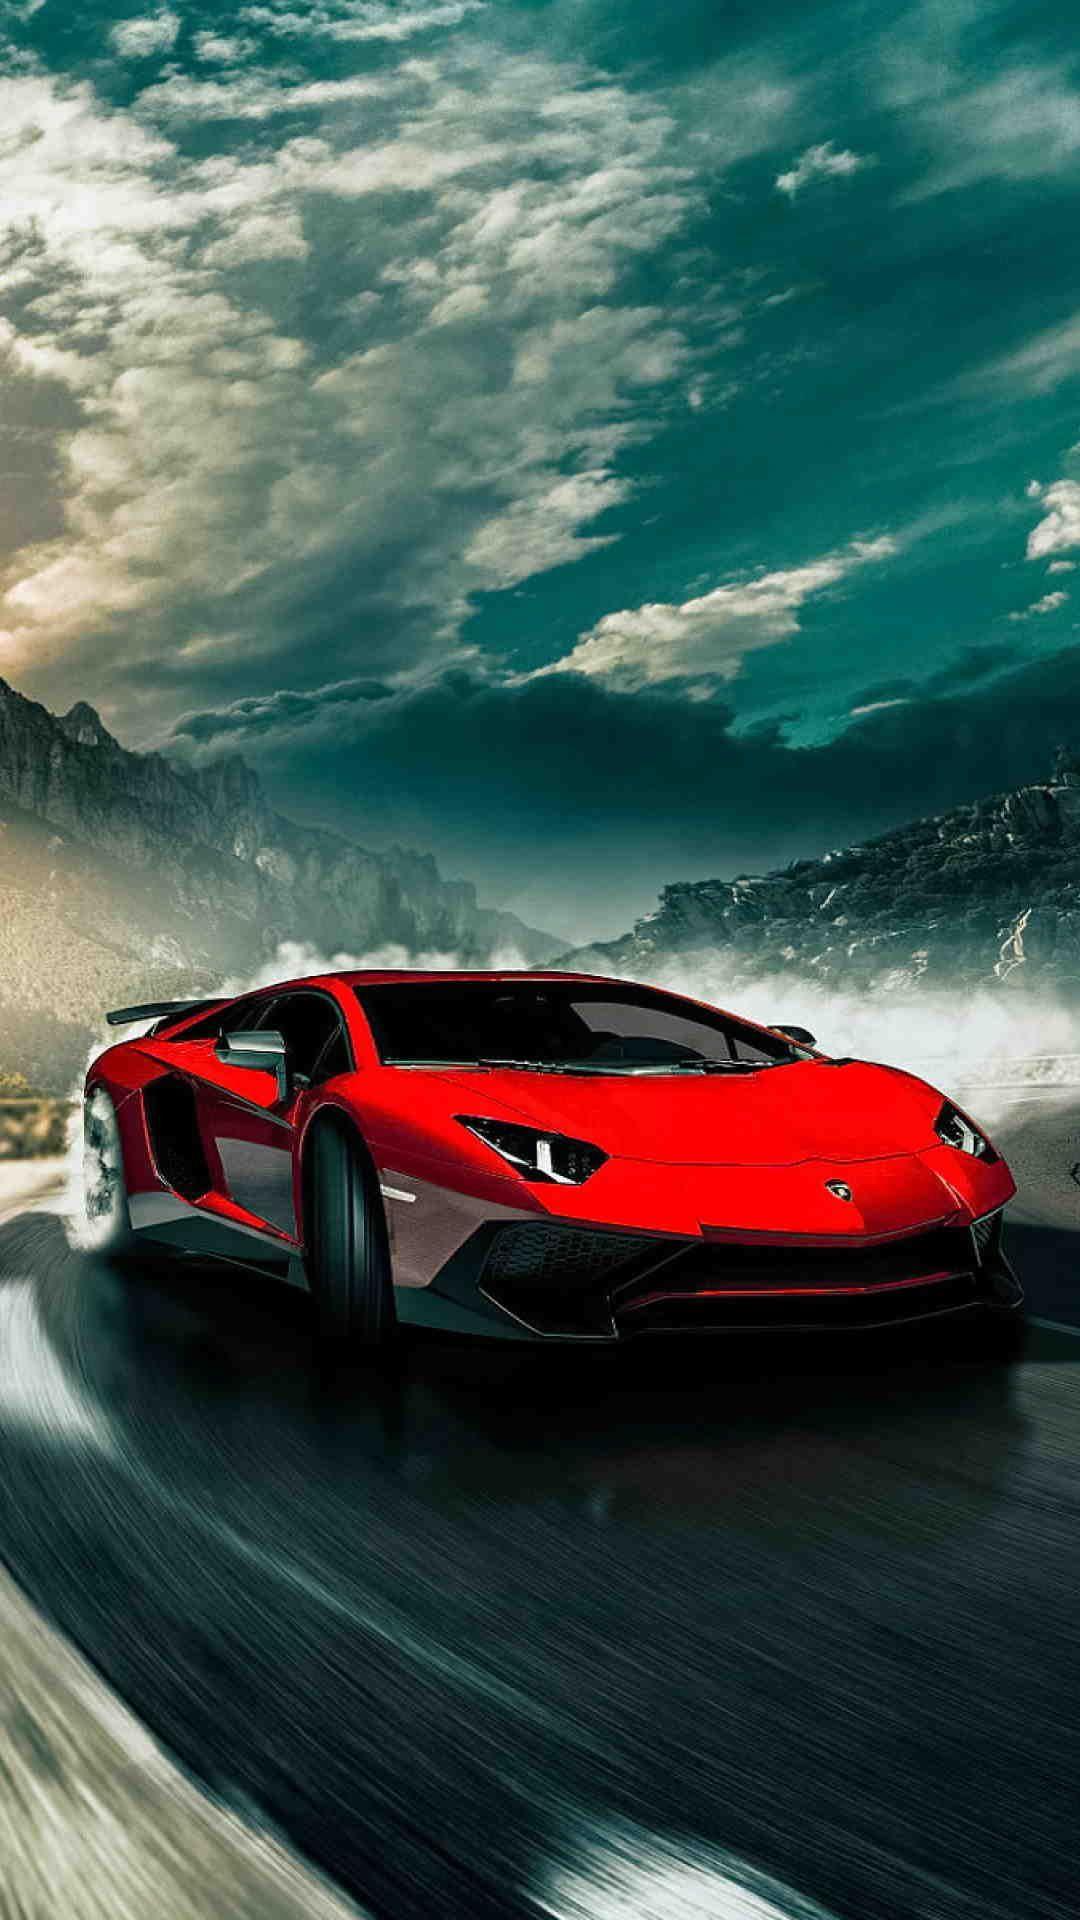 Lamborghini Aventador Lamborghini Cars Super Luxury Cars Lamborghini Aventador